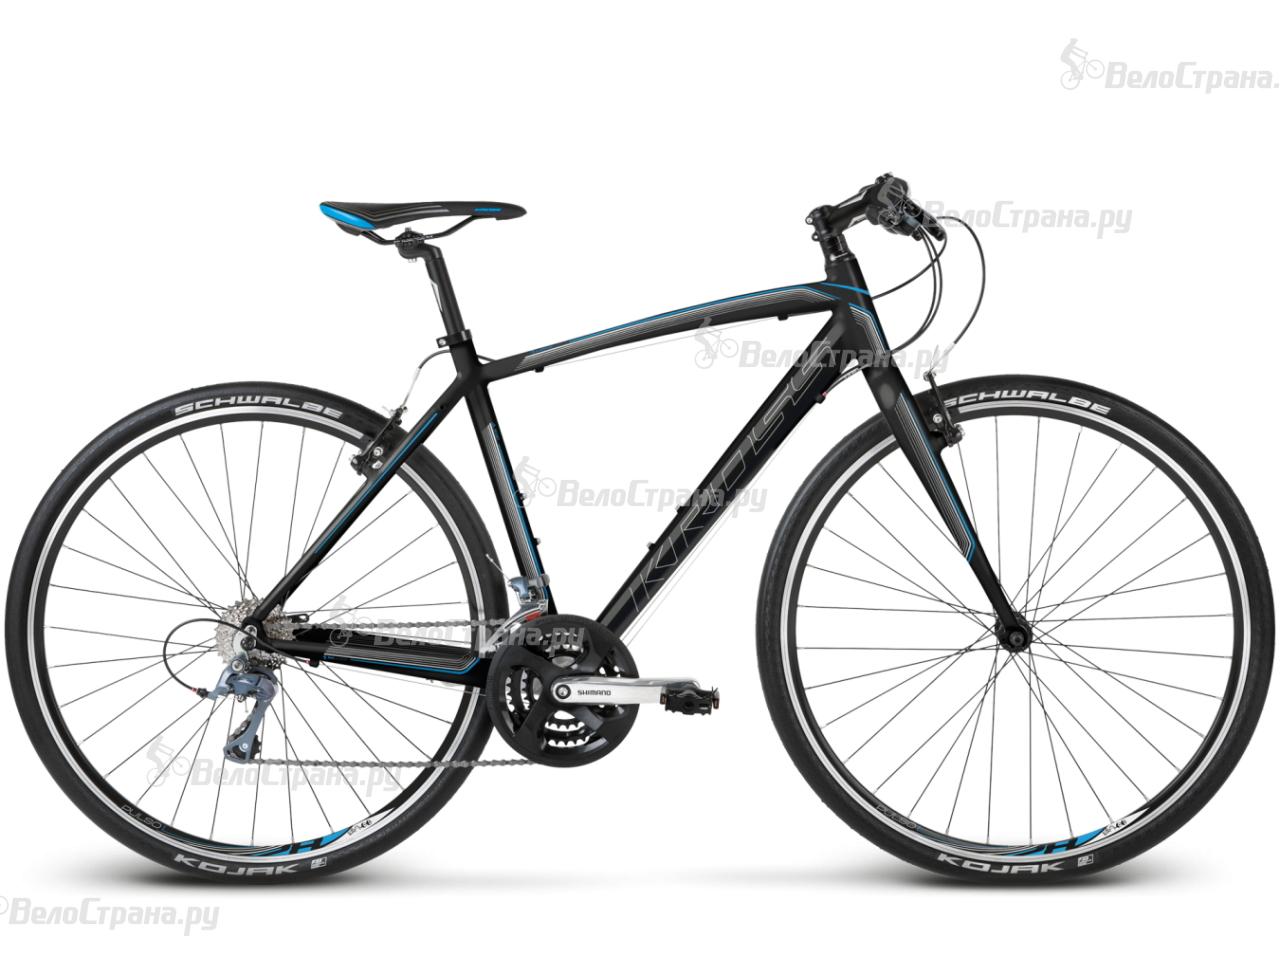 Велосипед Kross PULSO 1 (2017) велосипед kross pulso 1 2015